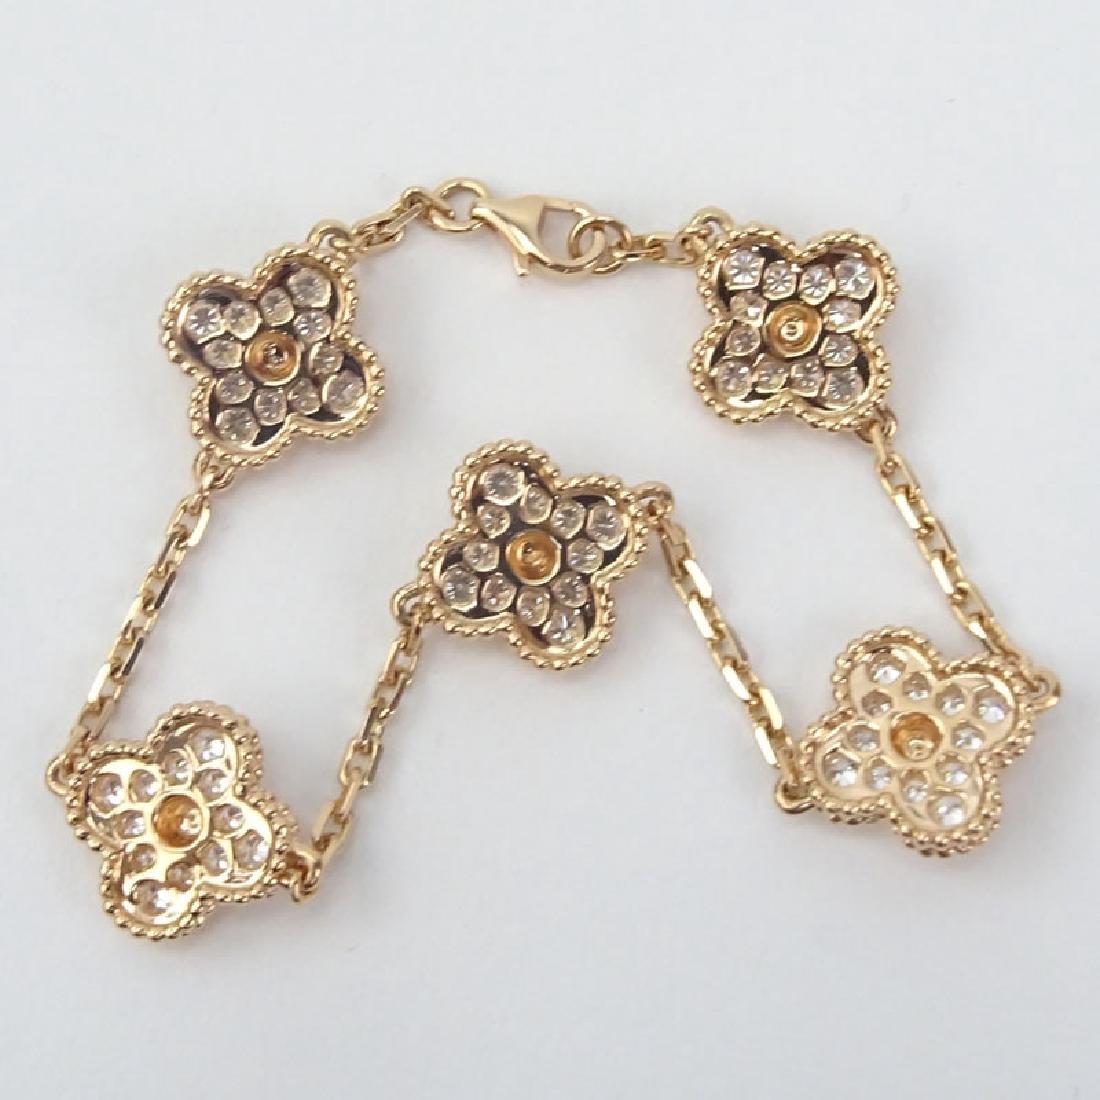 Van Cleef & Arpels style Diamond and 18 Karat Rose Gold - 3